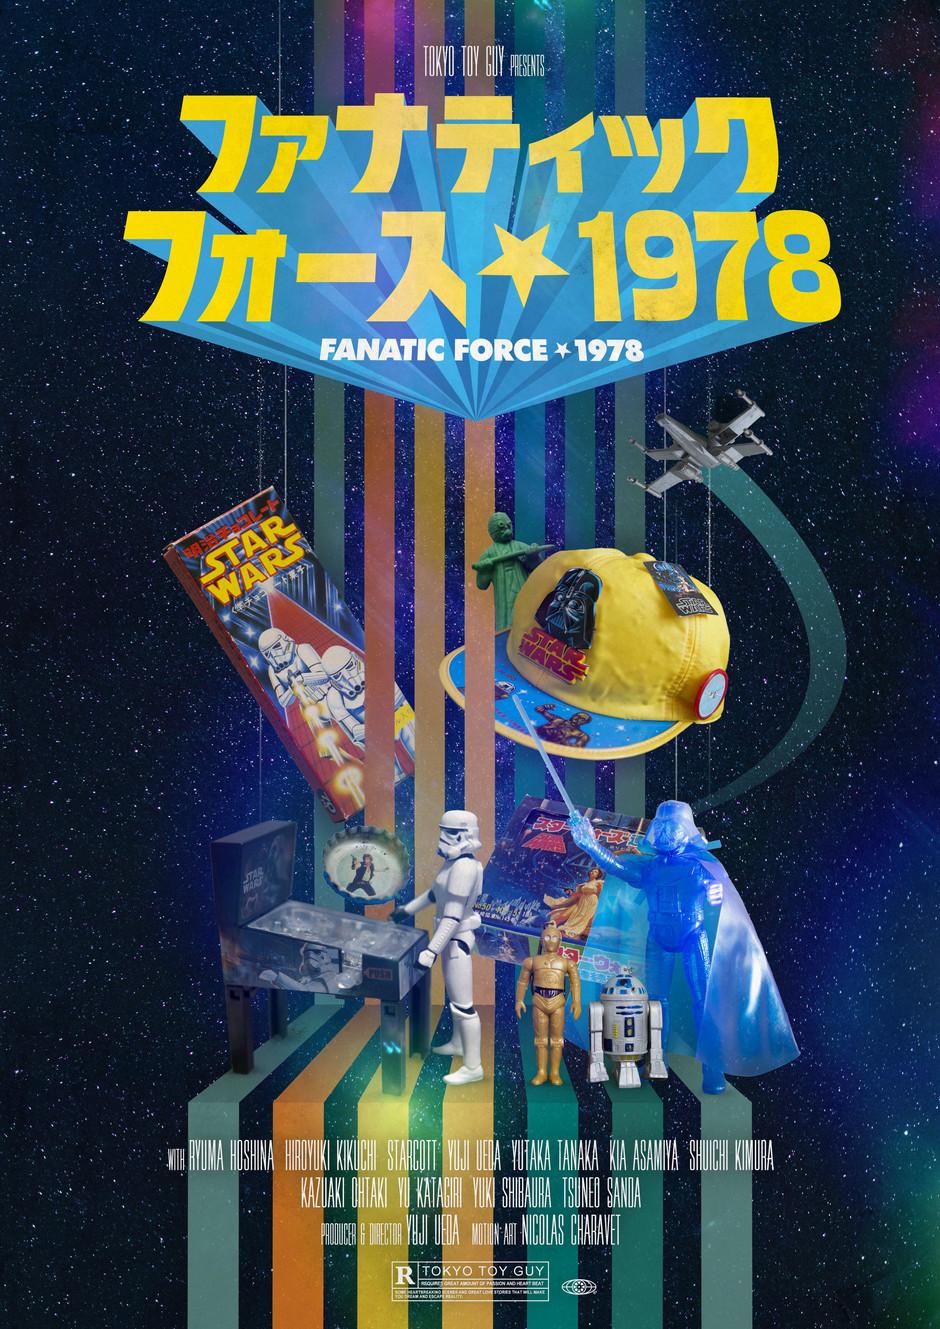 Star Wars - Fanatic Force 1978